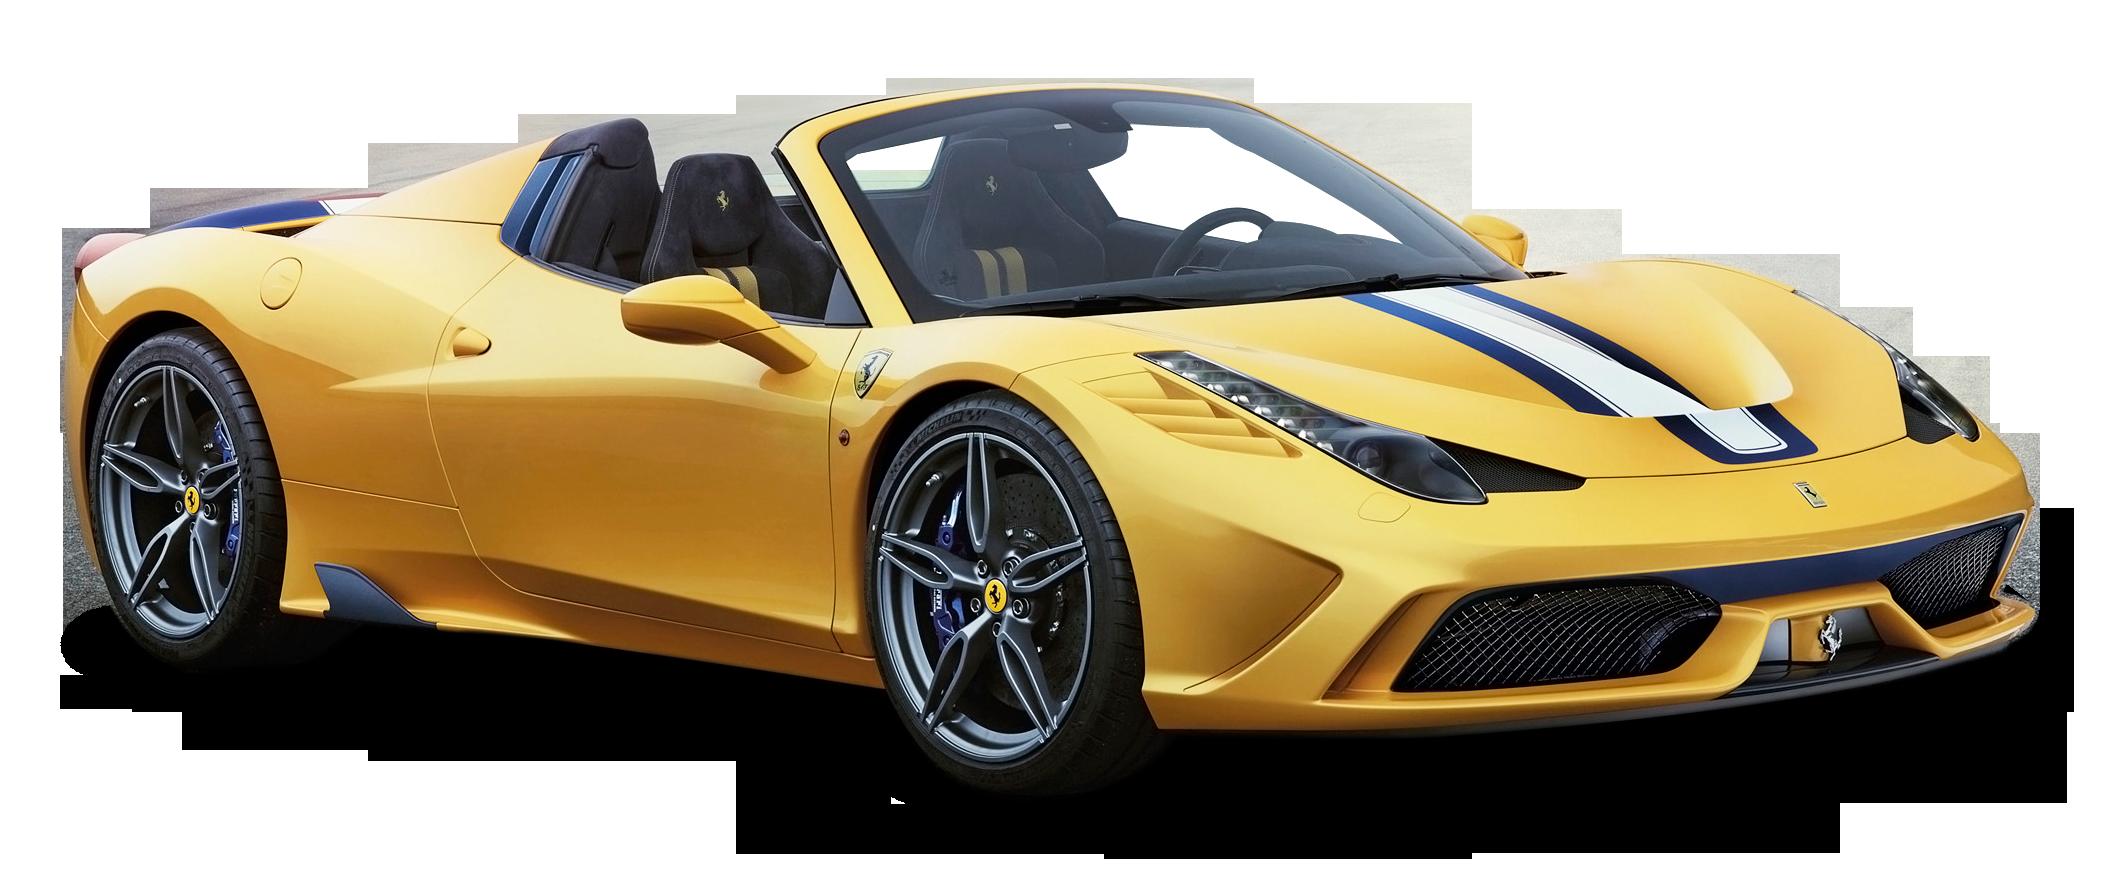 Download Yellow Ferrari 458 Speciale Car Png Image For Free Ferrari 458 Speciale Sports Cars Luxury Ferrari